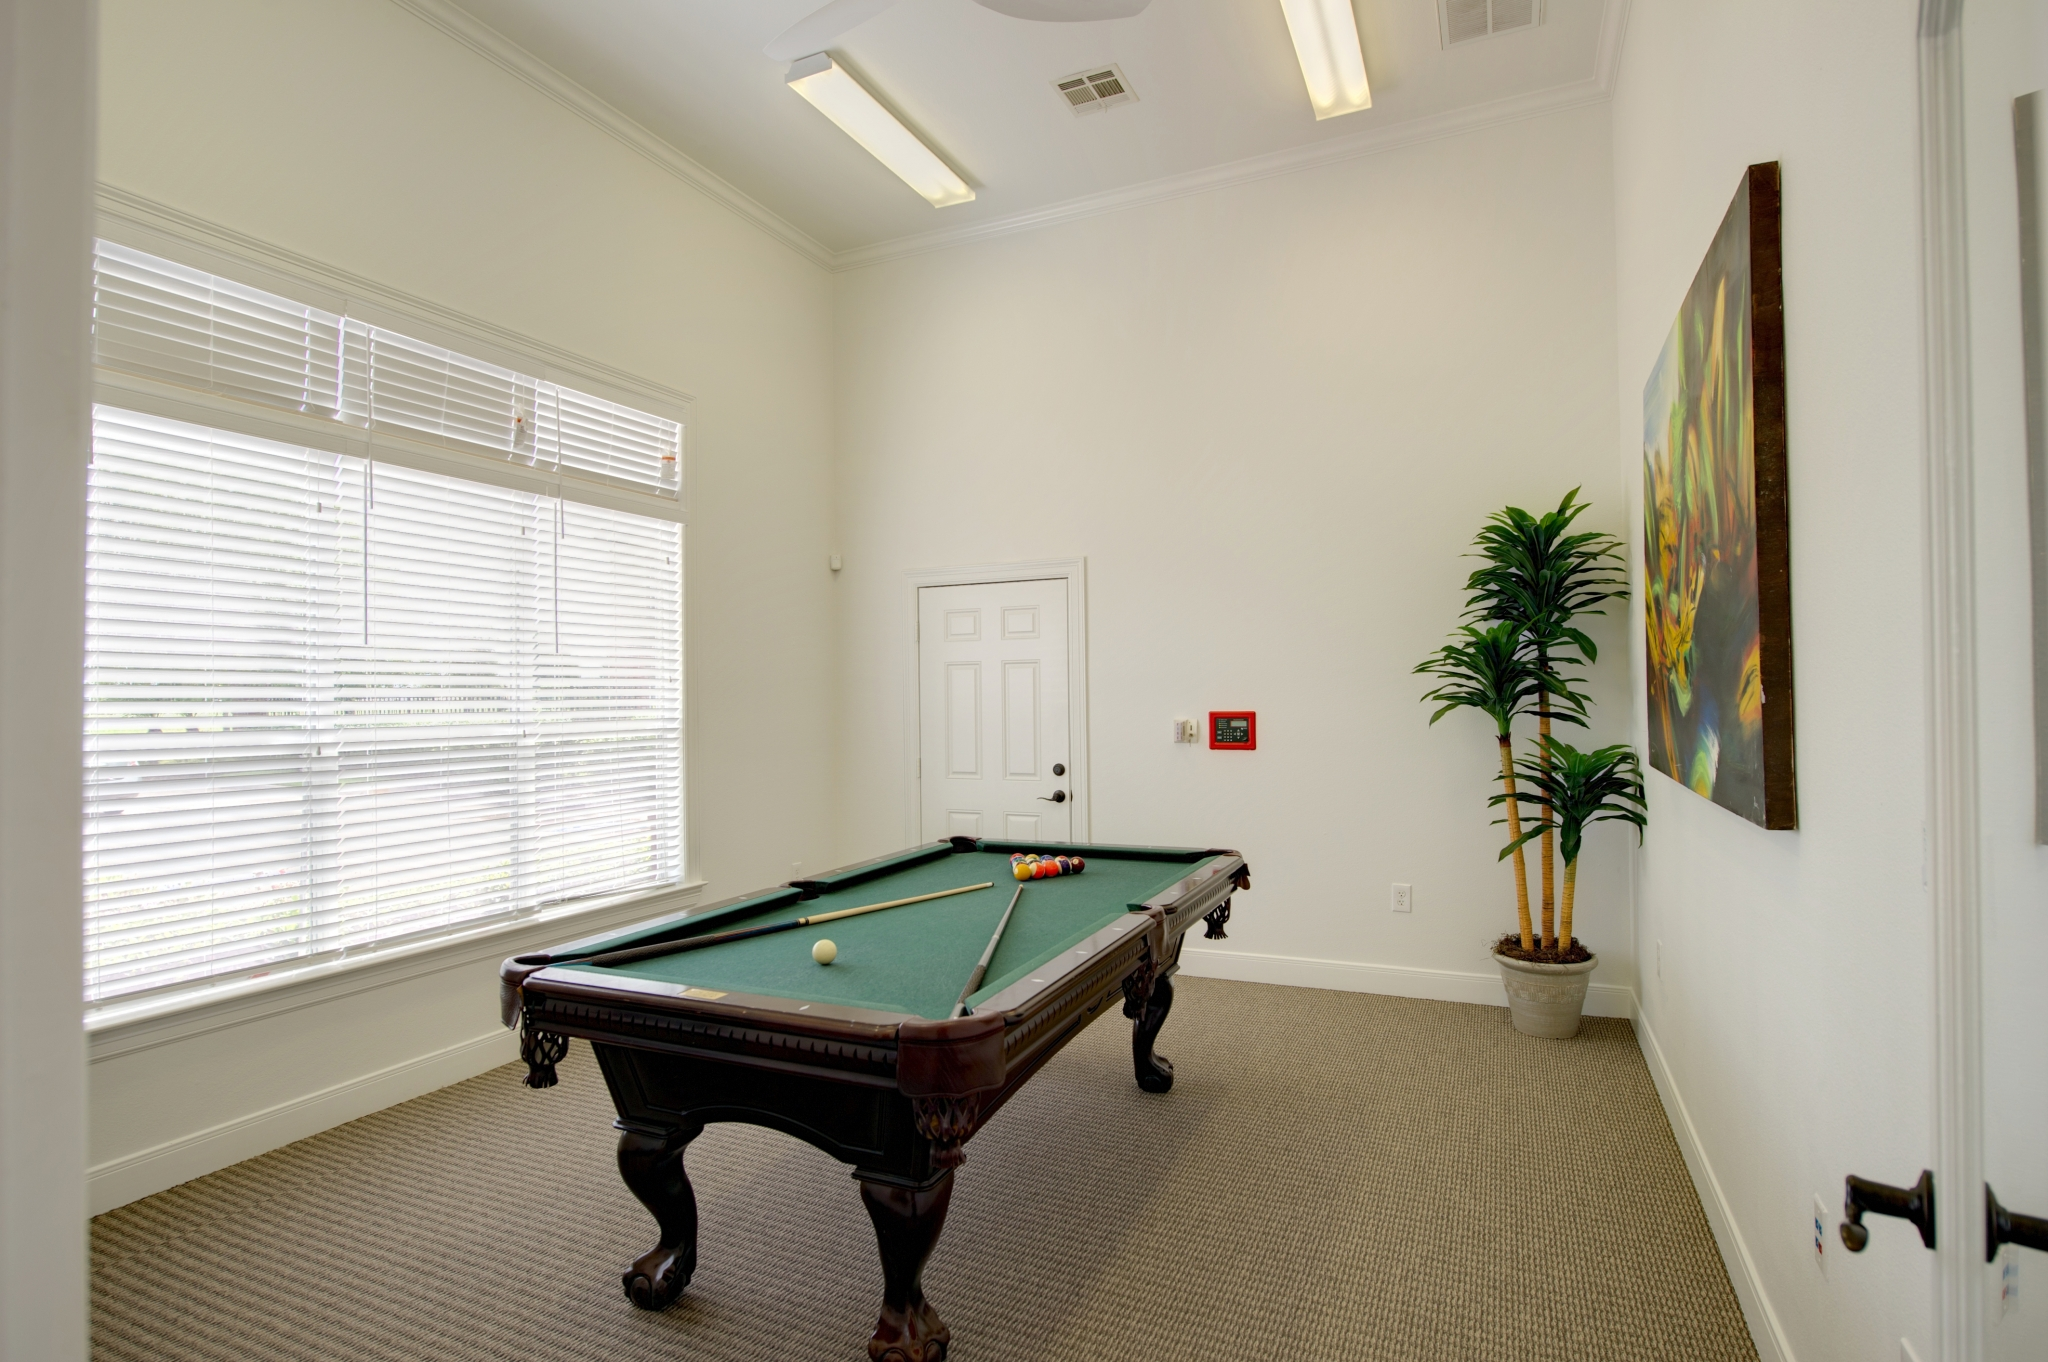 4 bedroom apartments pearland texas - Amenities